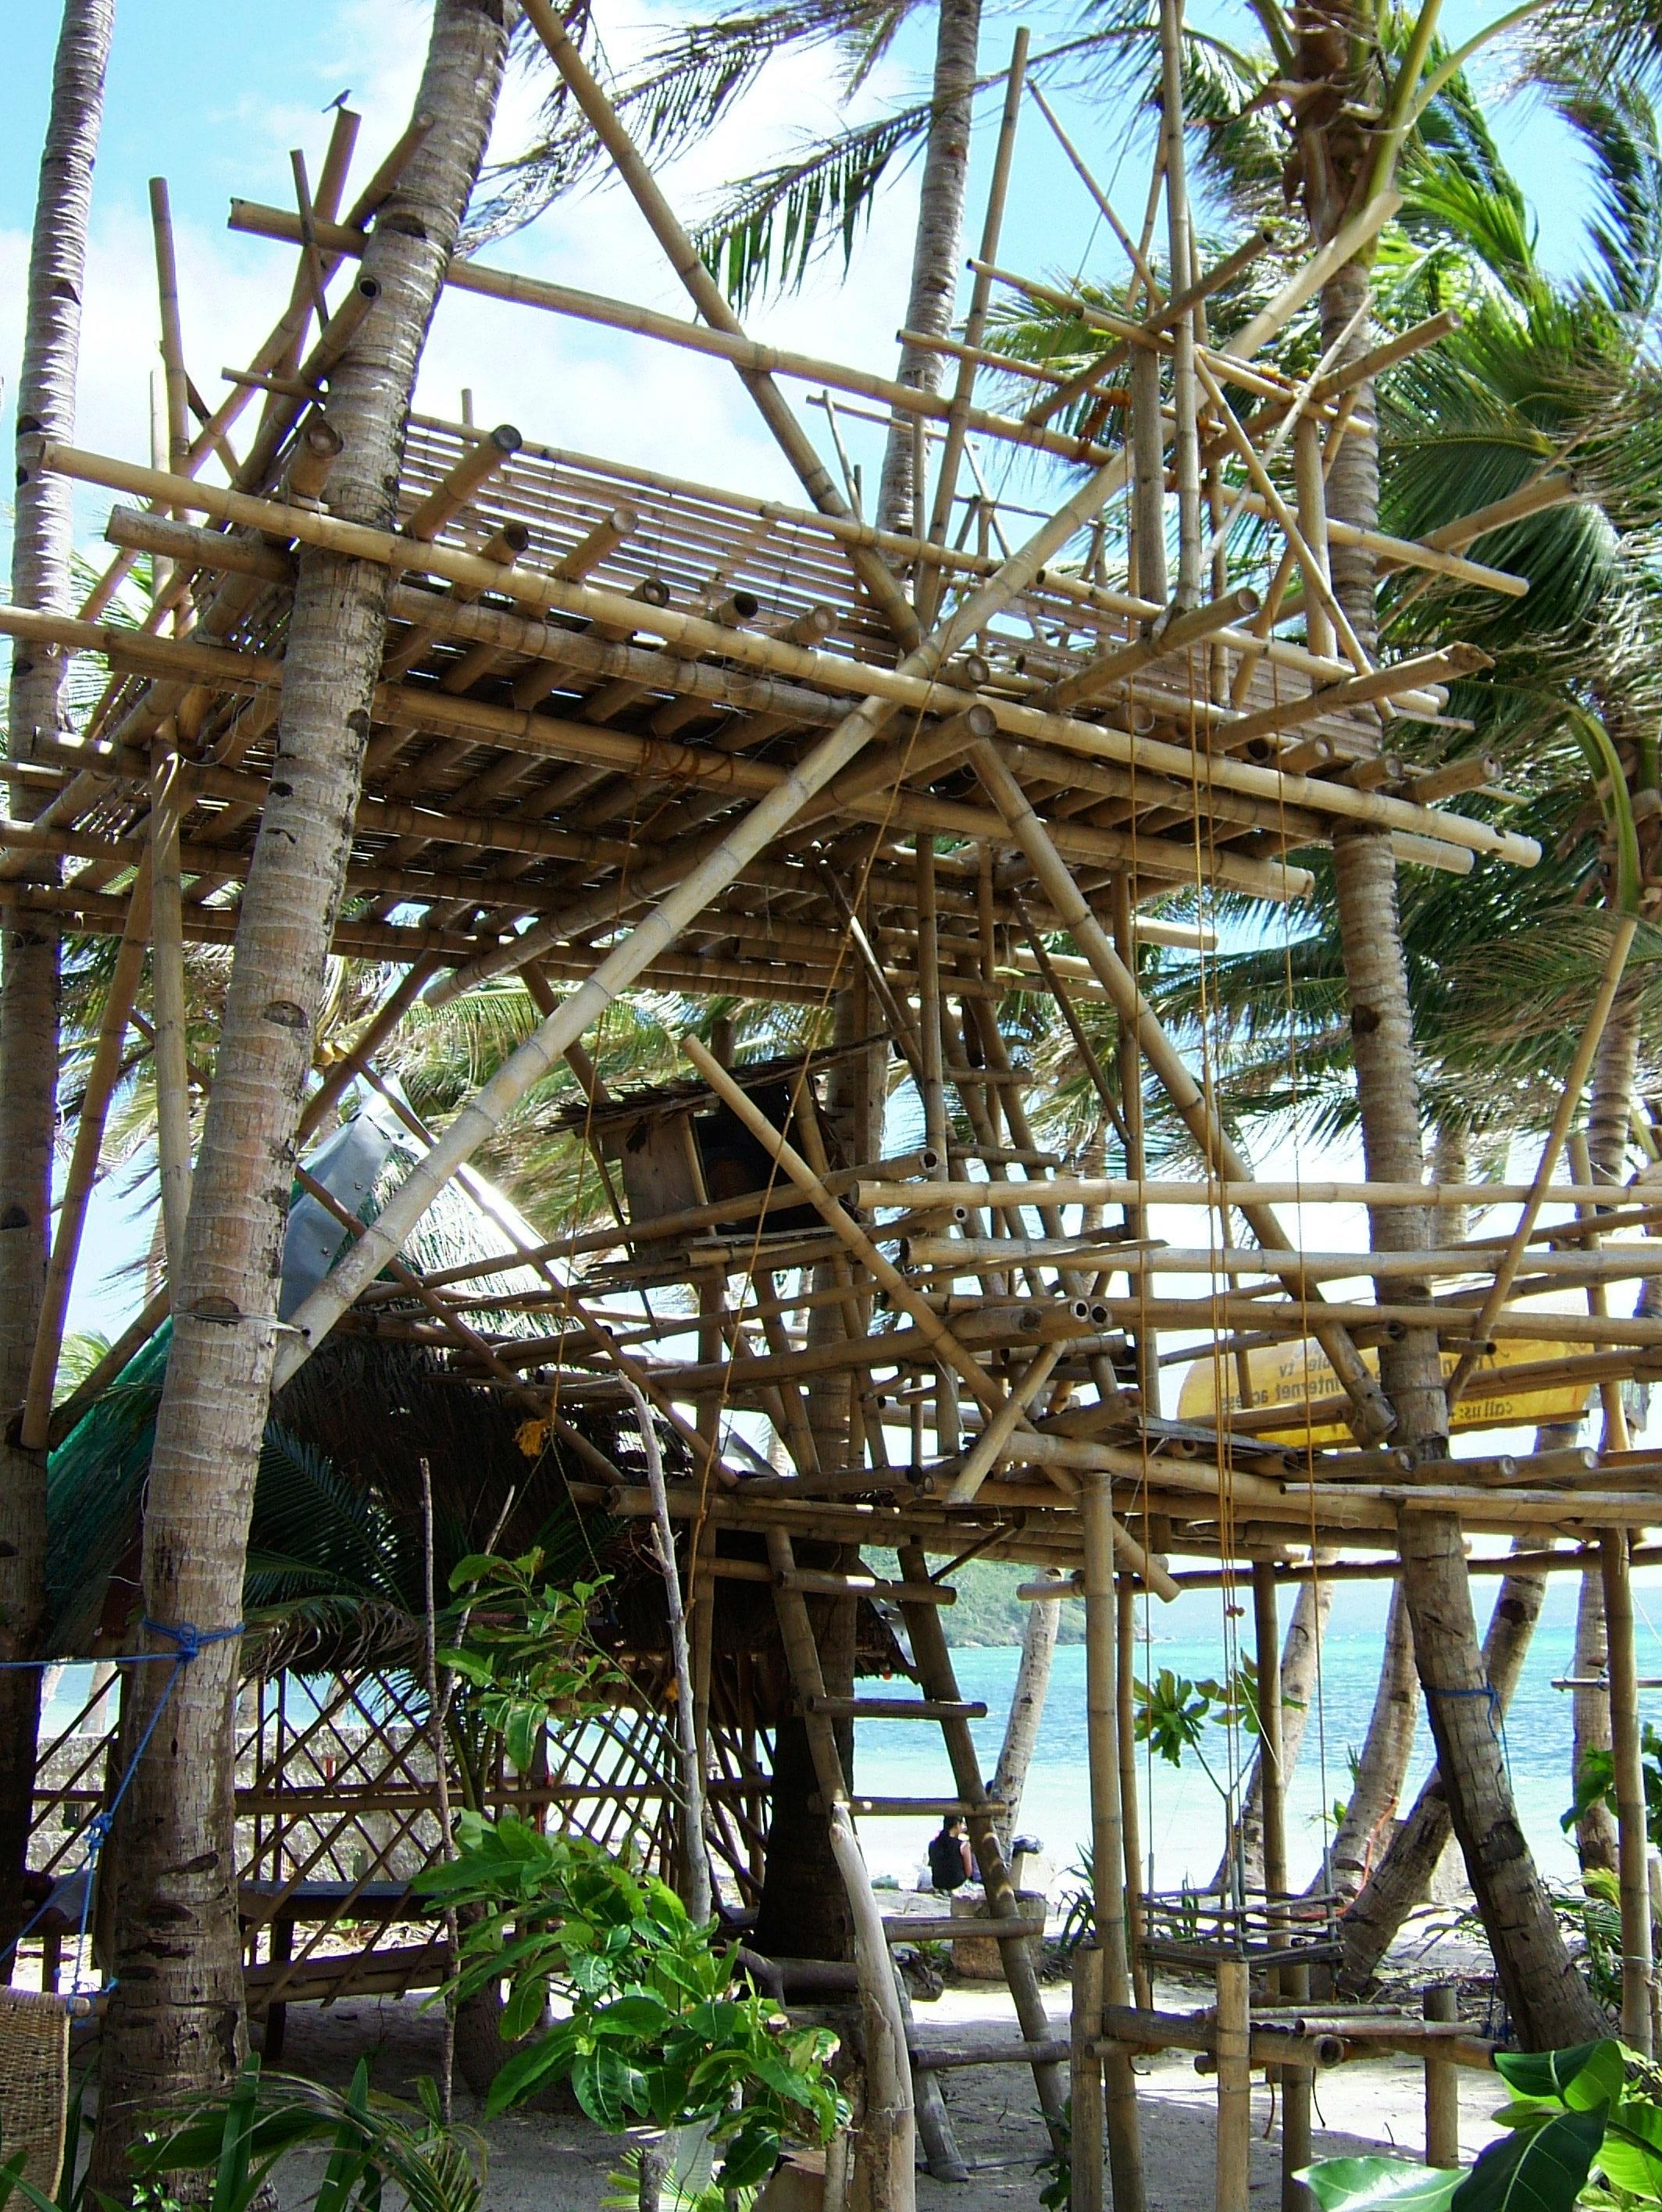 Philippines Sugar Islands Boracay Punta bunga beach Resorts May 2007 06